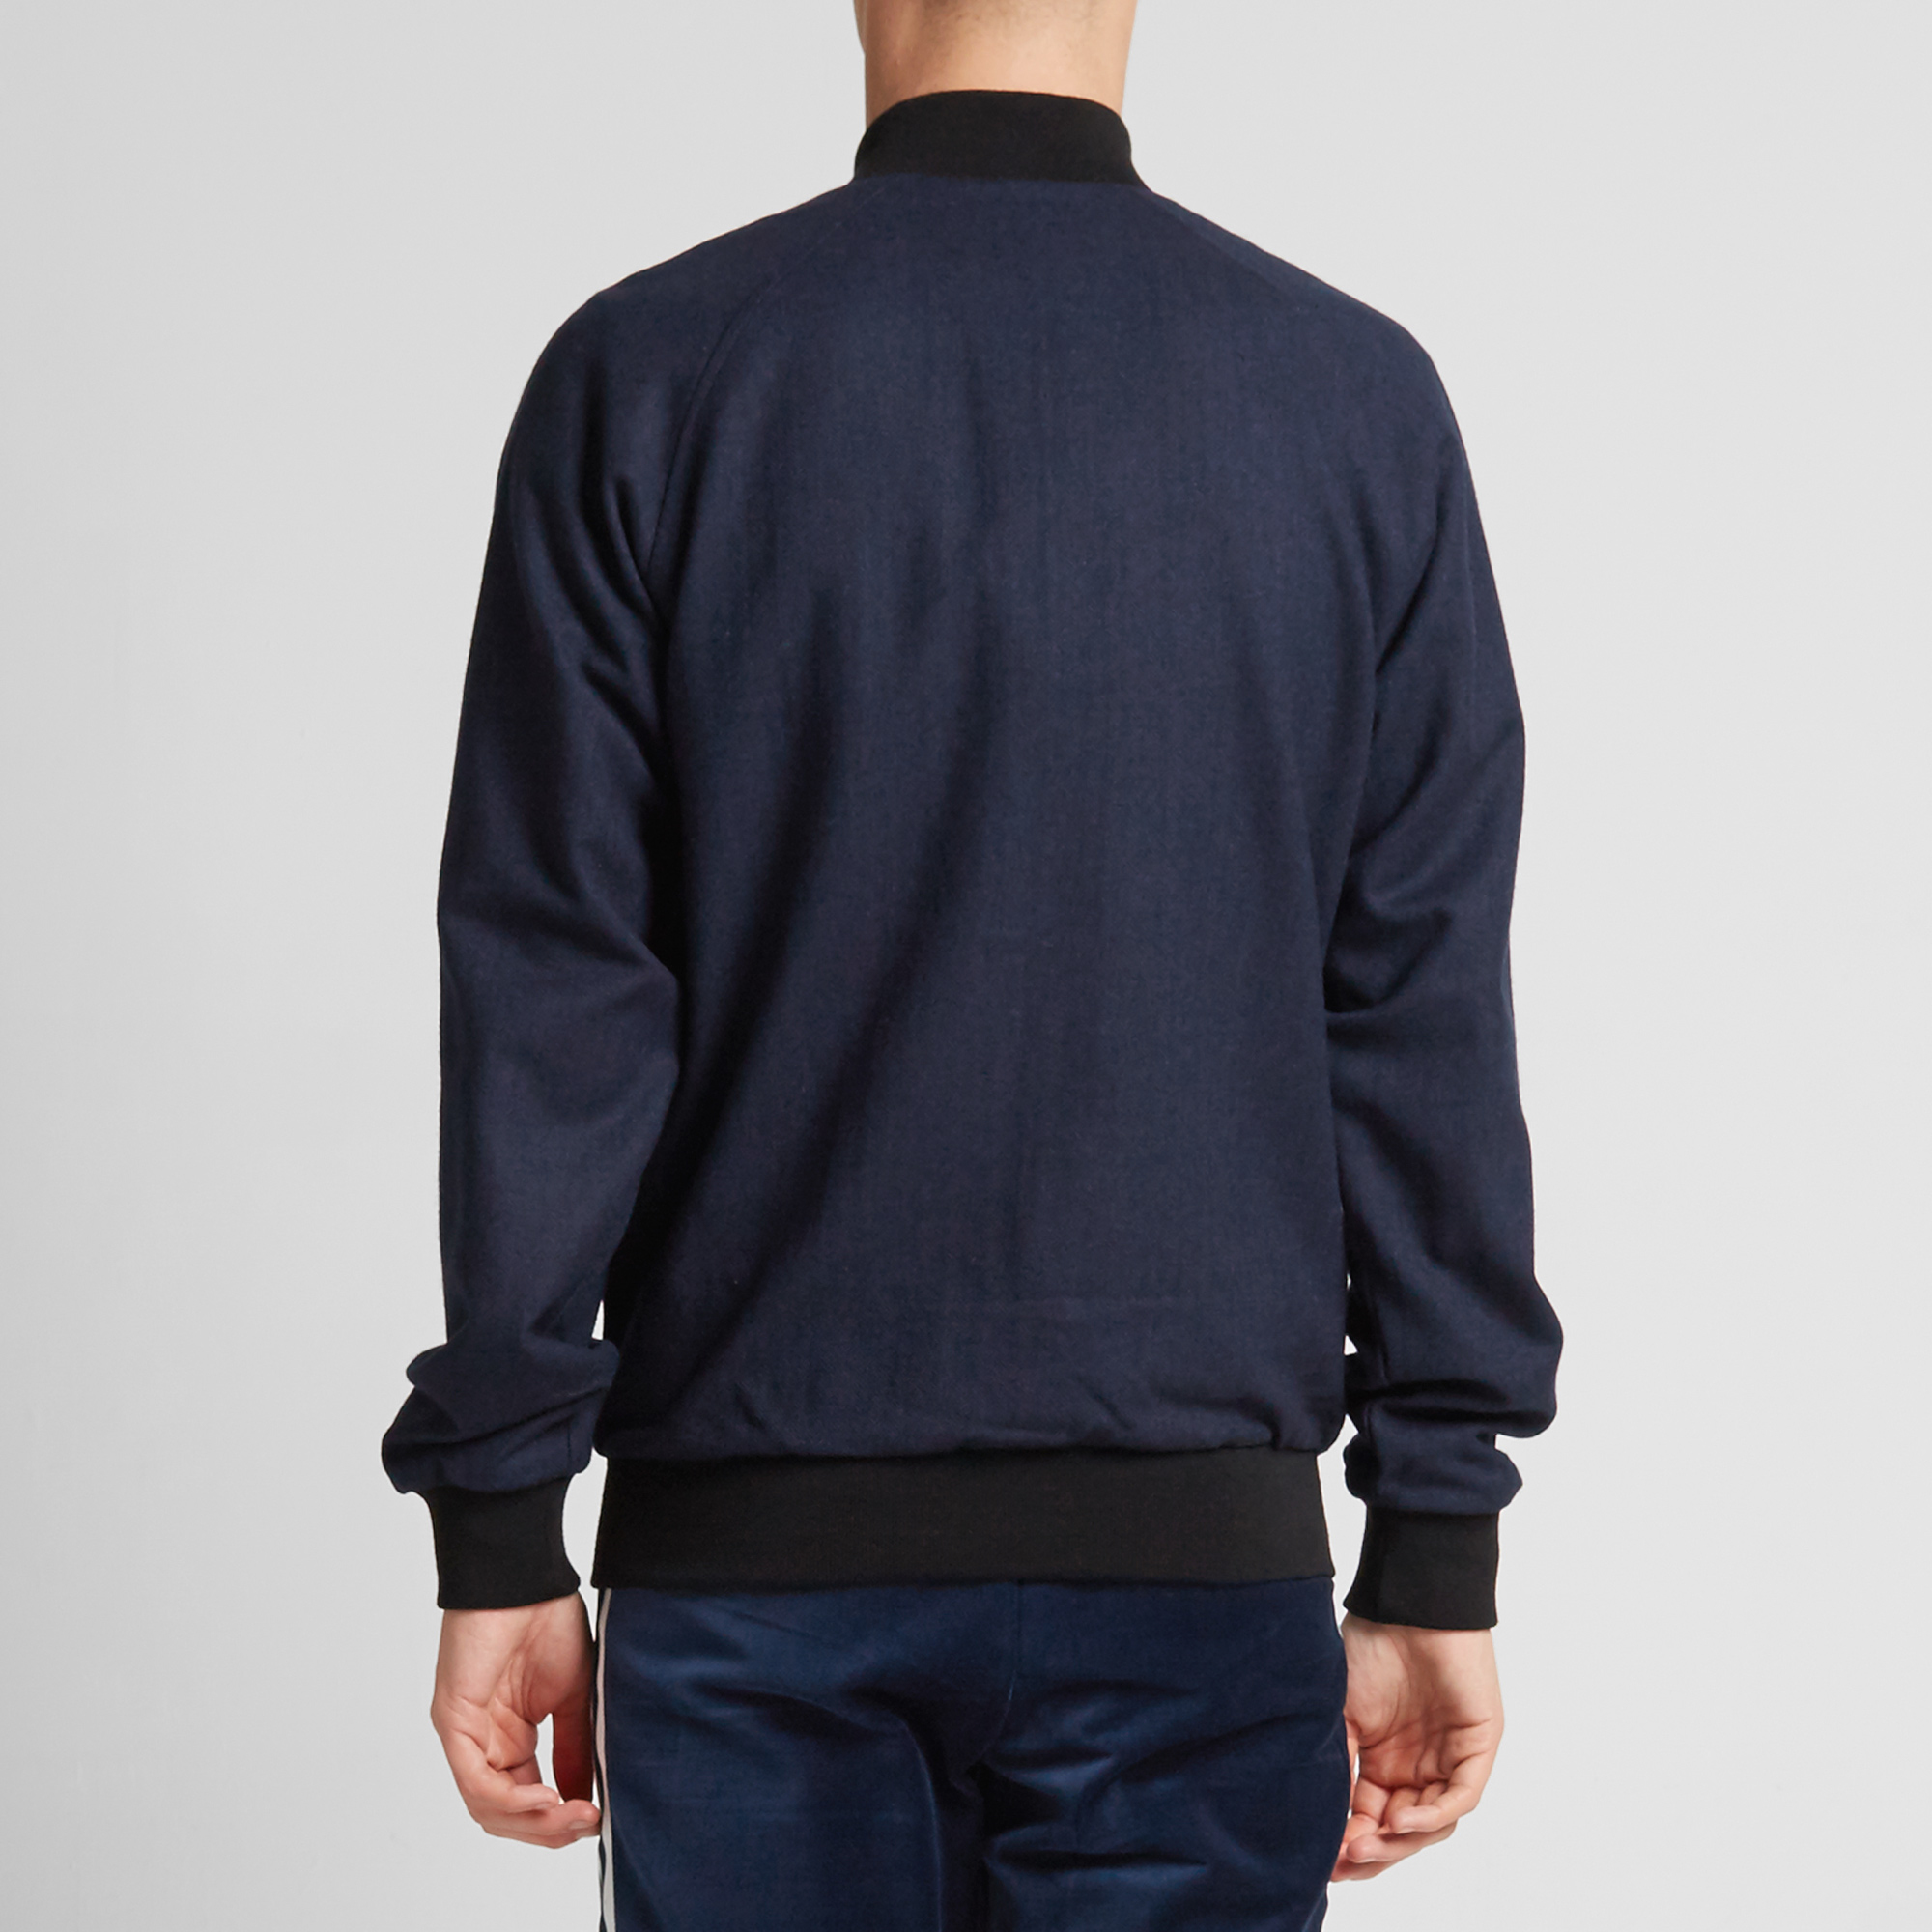 navy adidas jacket